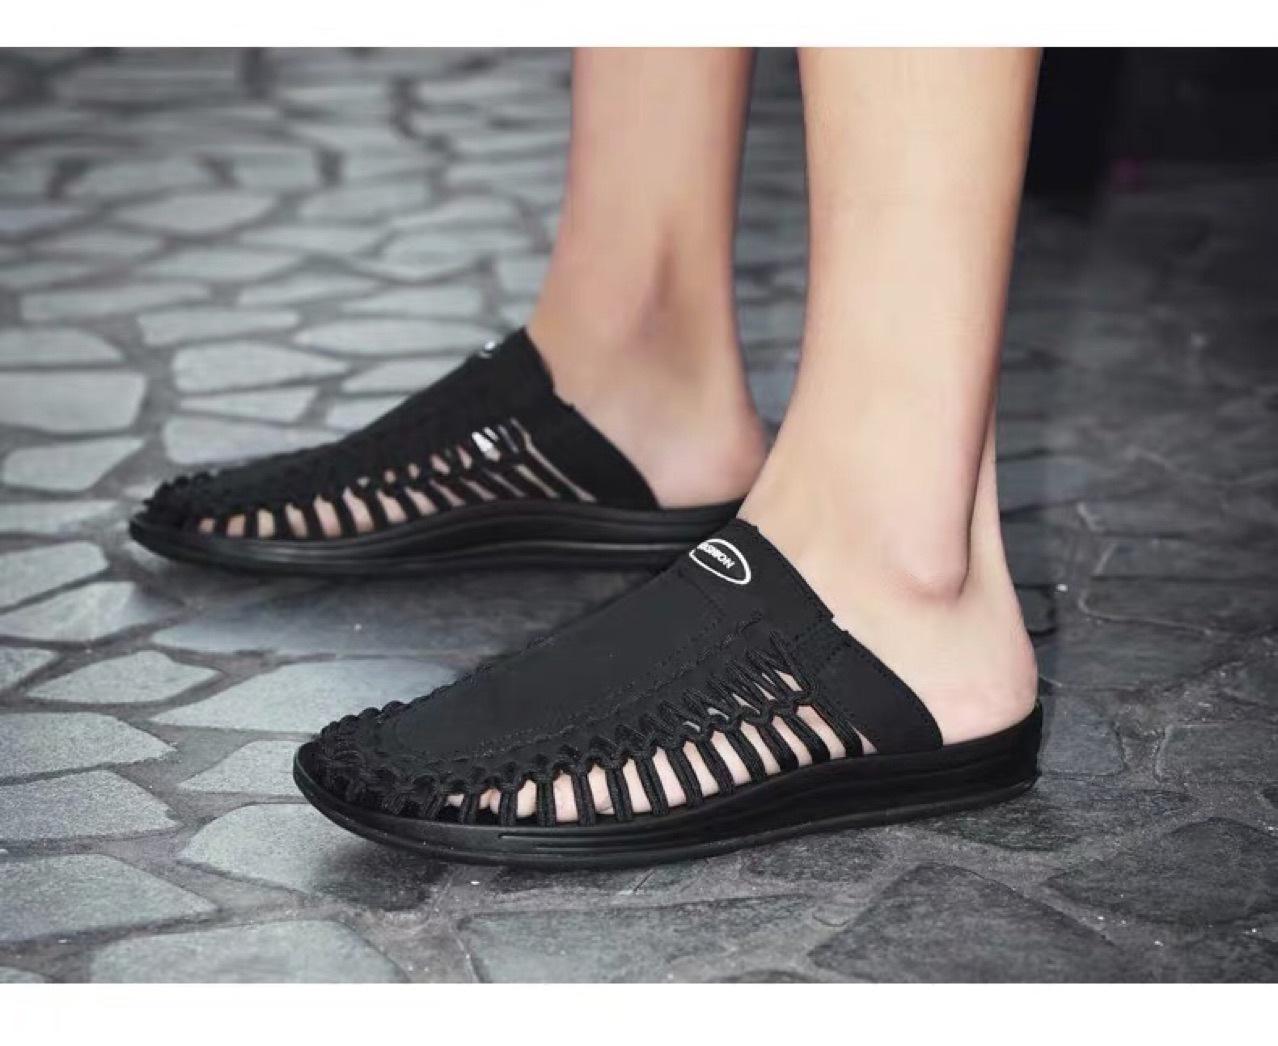 2020 new mens sandals Roman beach slippers hollow sandals hand woven slippers summer mens slippers